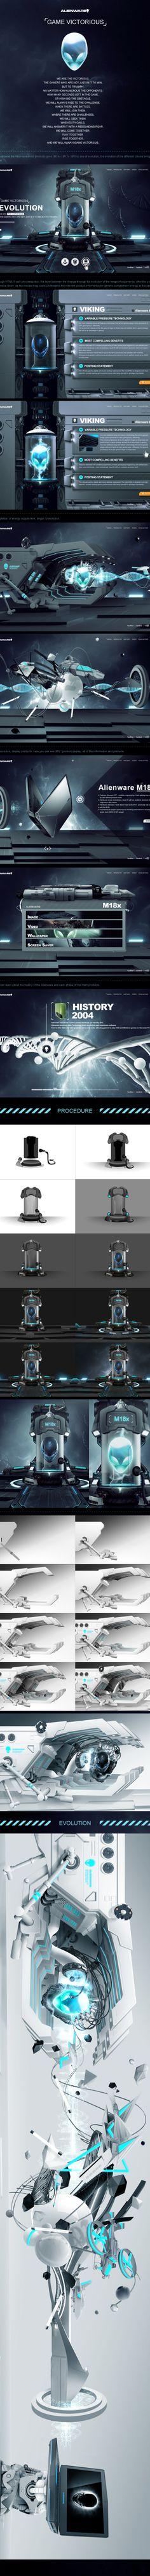 Alienware_Evolution by wei geng, via Behance